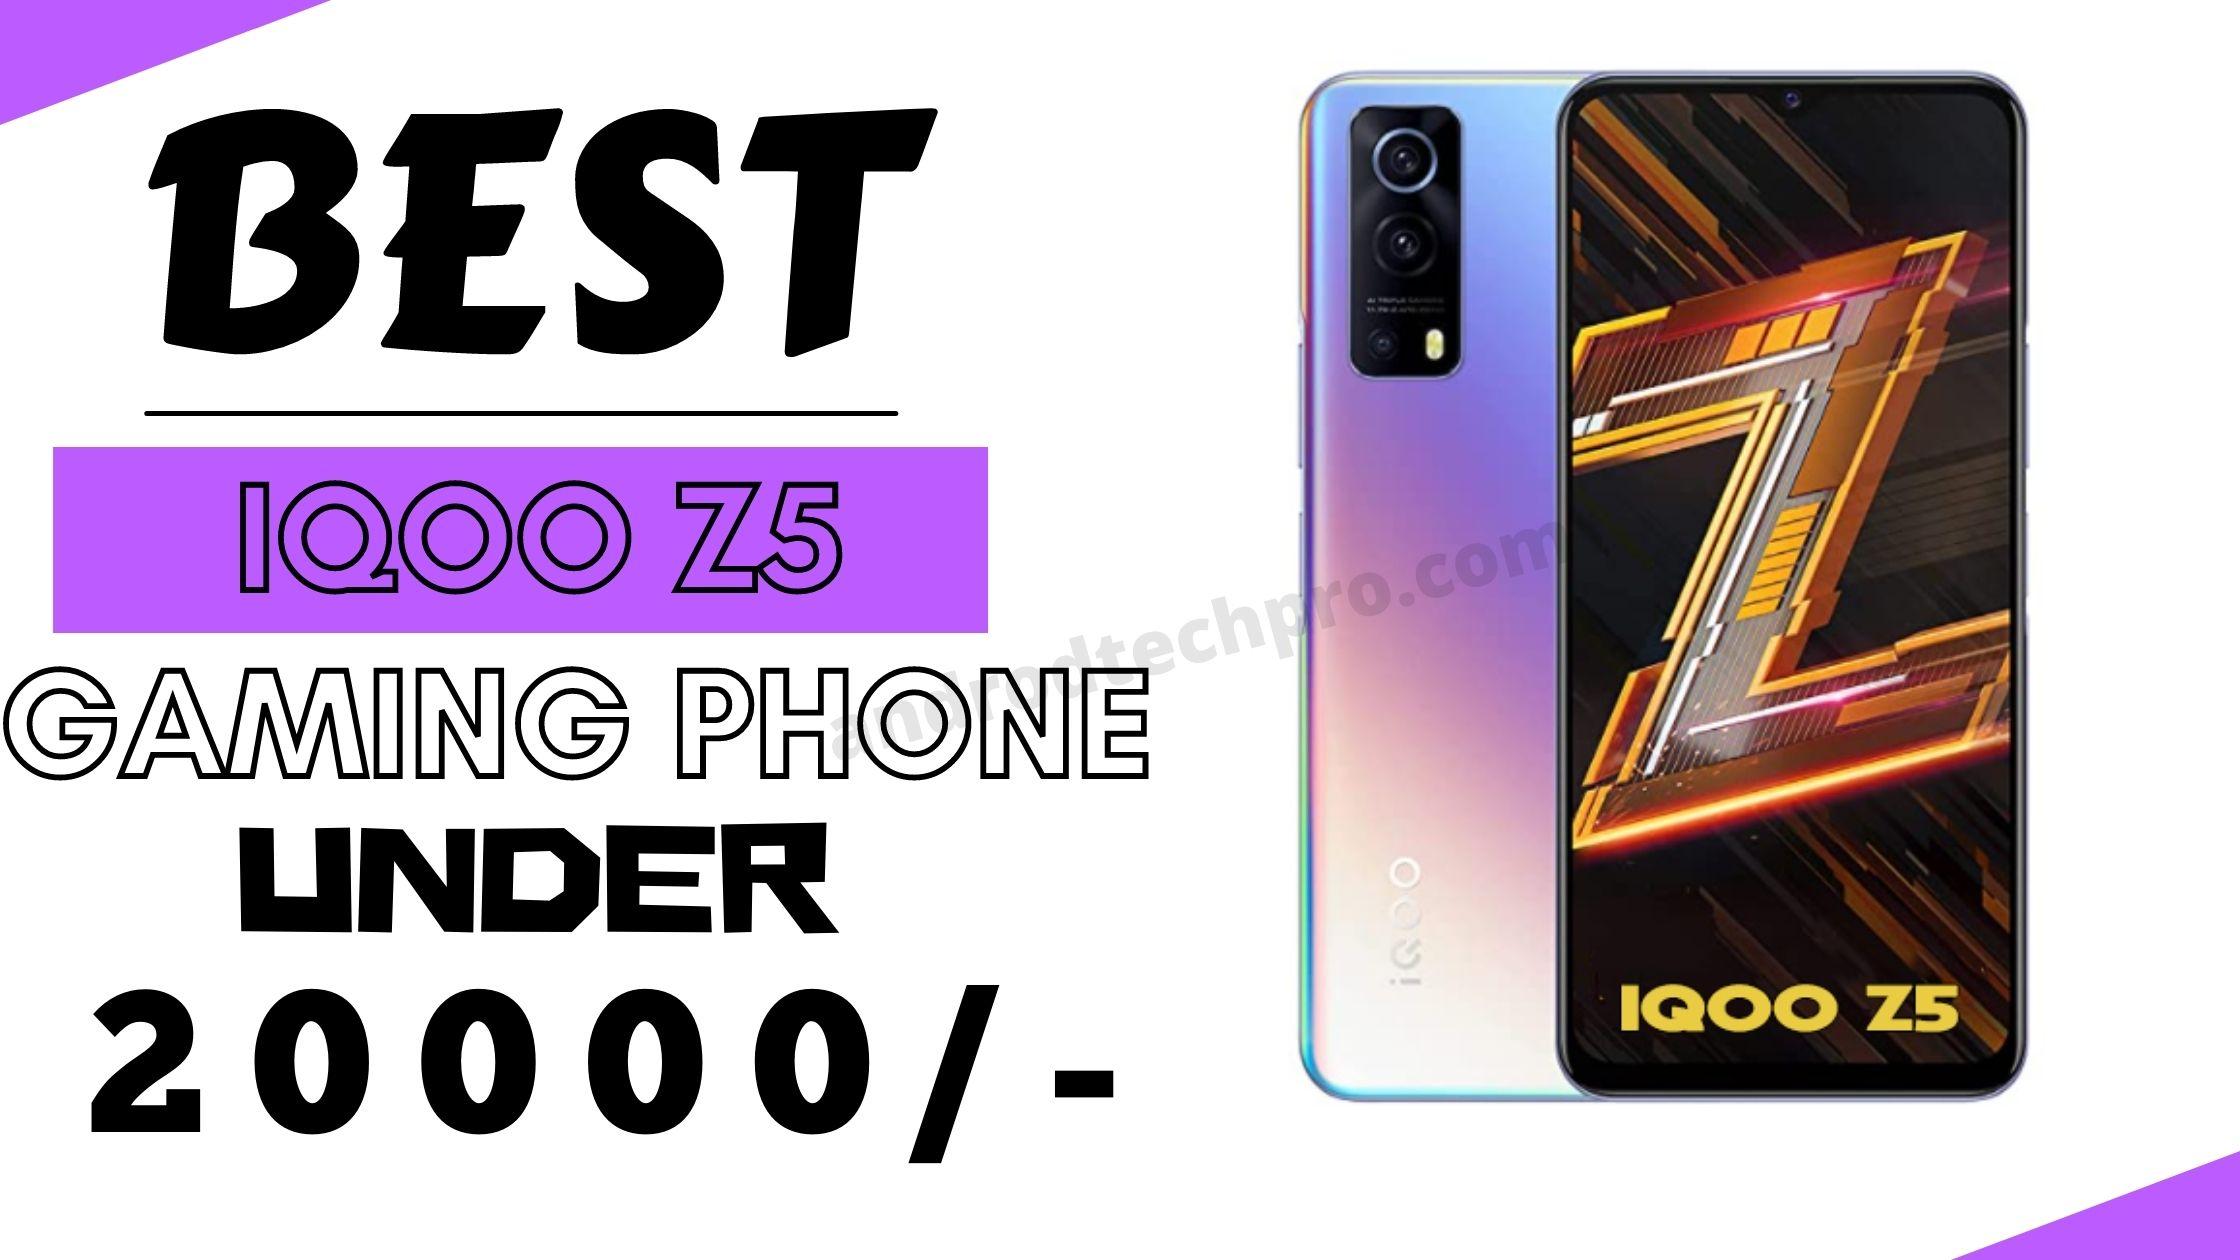 bEST GAMING PHONE UNDER 20000